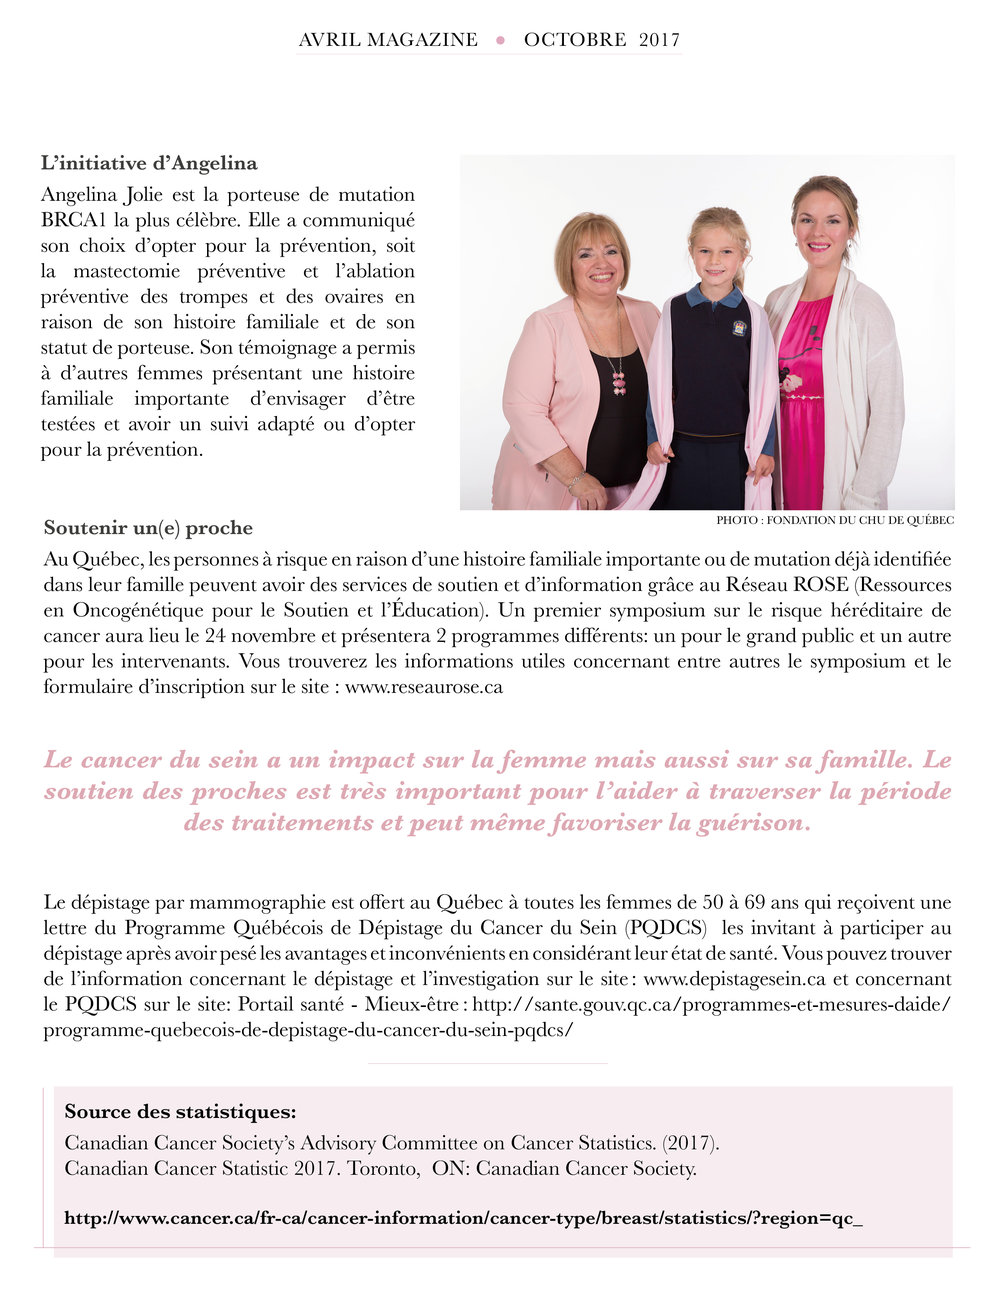 Article-Jocelyne-chiquette2.jpg